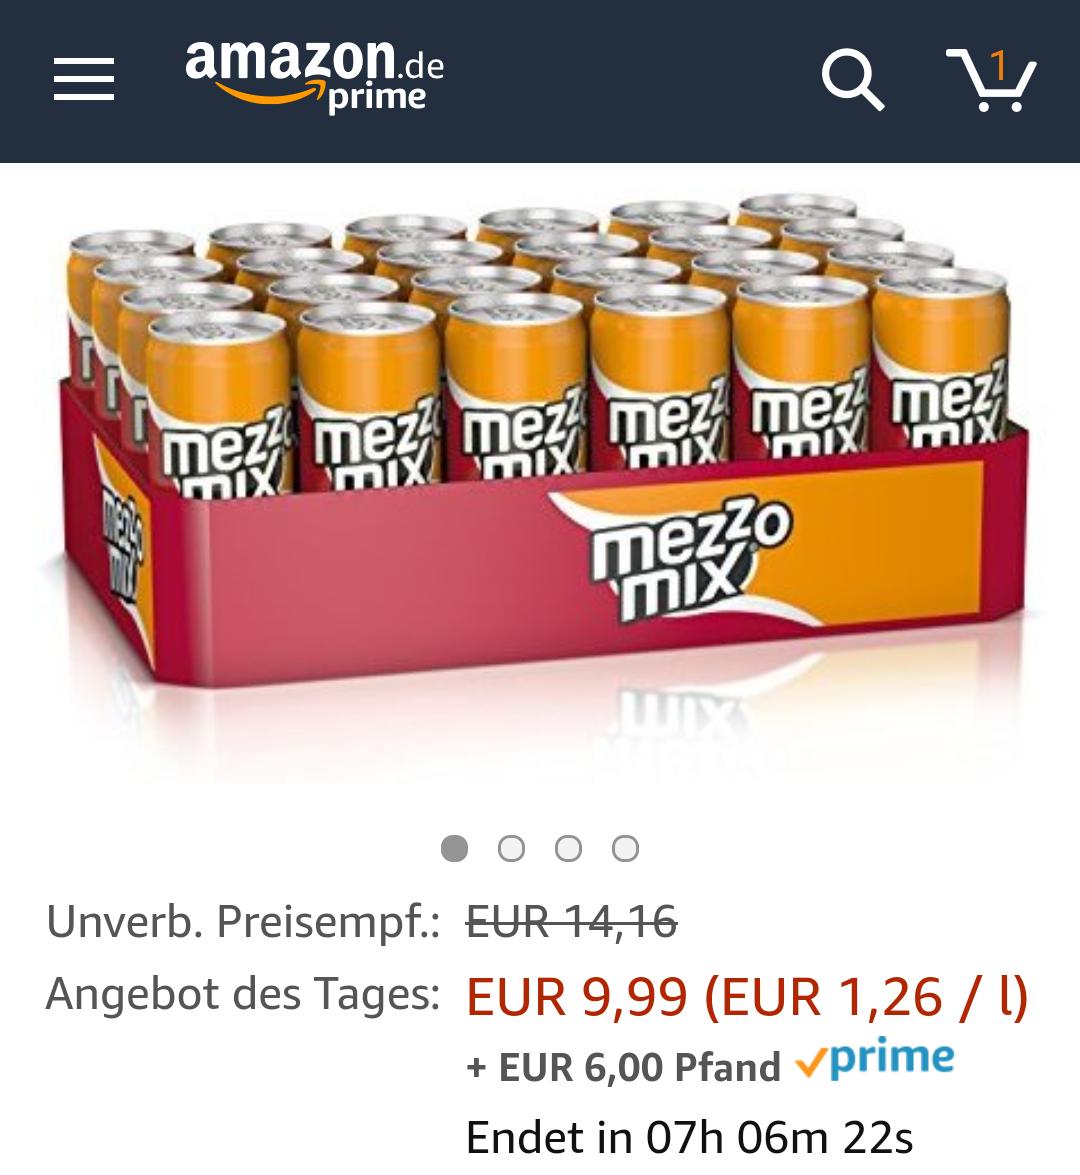 [Amazon Prime only] Coca Cola & Mezzo Mix 24x 0,33l für 9,49€ im Sparabo